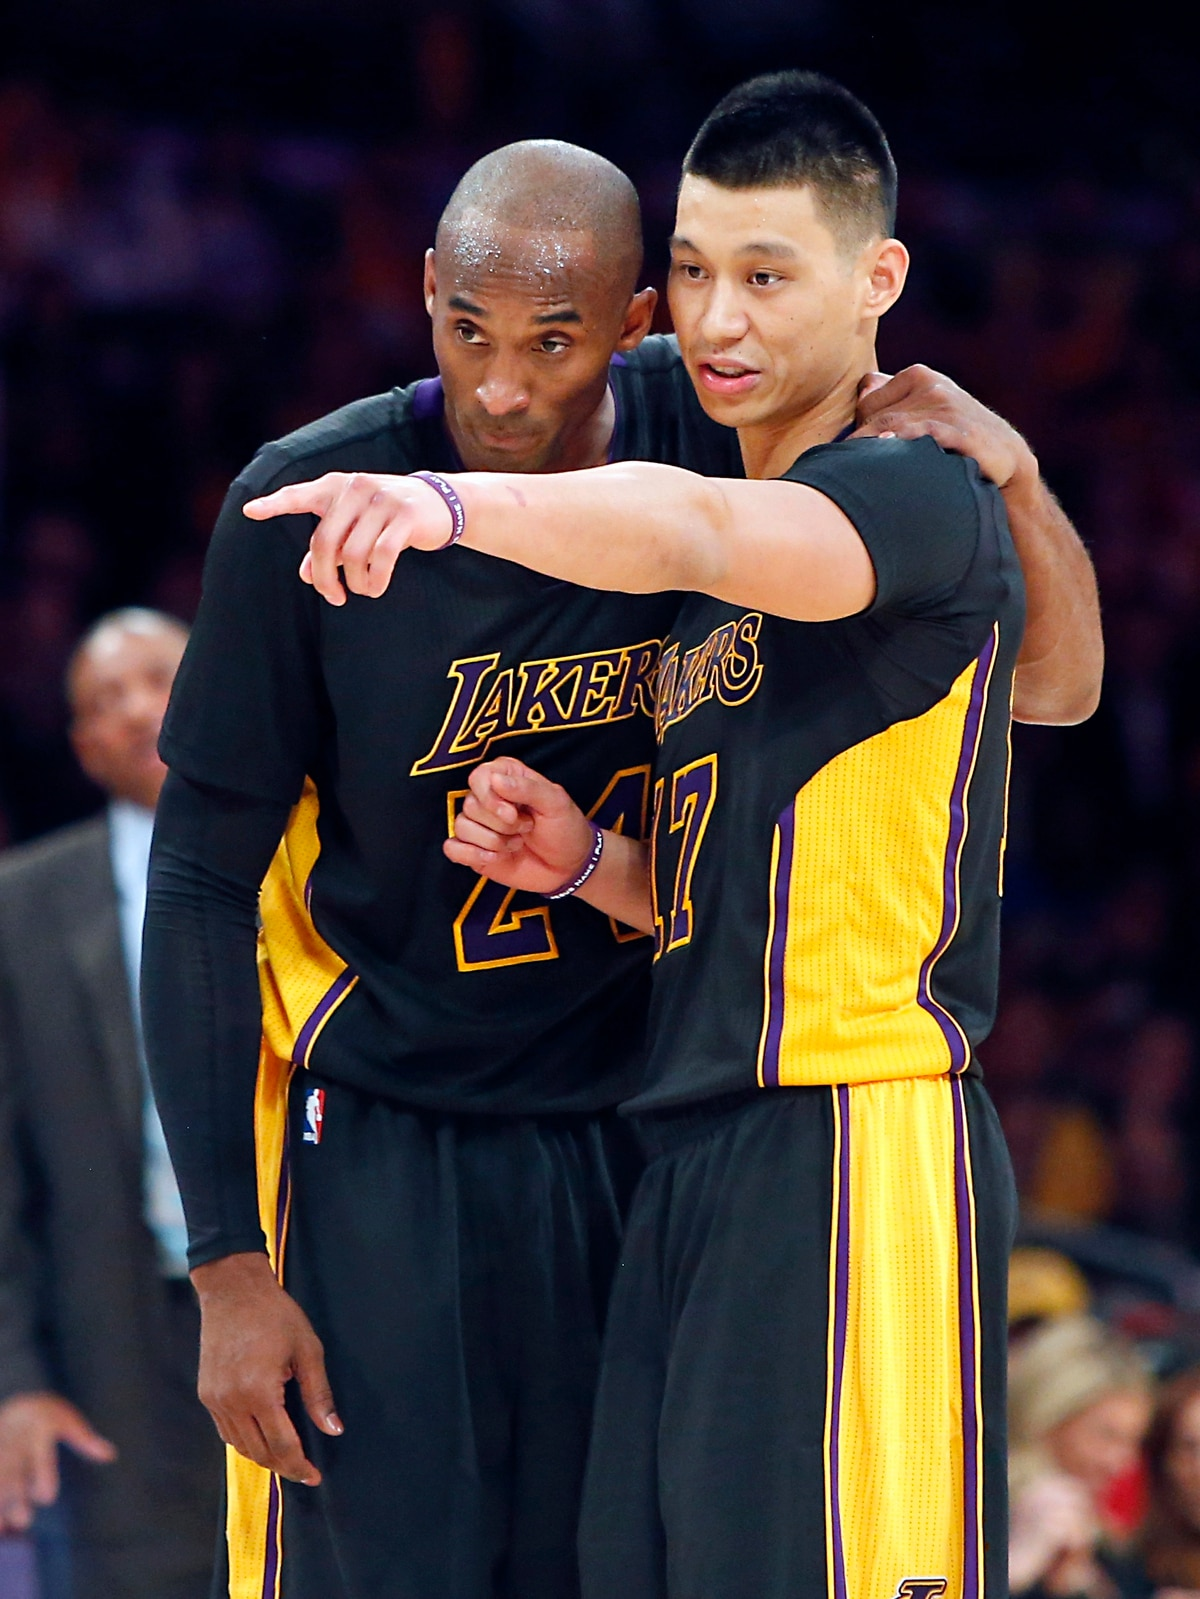 Image result for An NBA Basketball Player